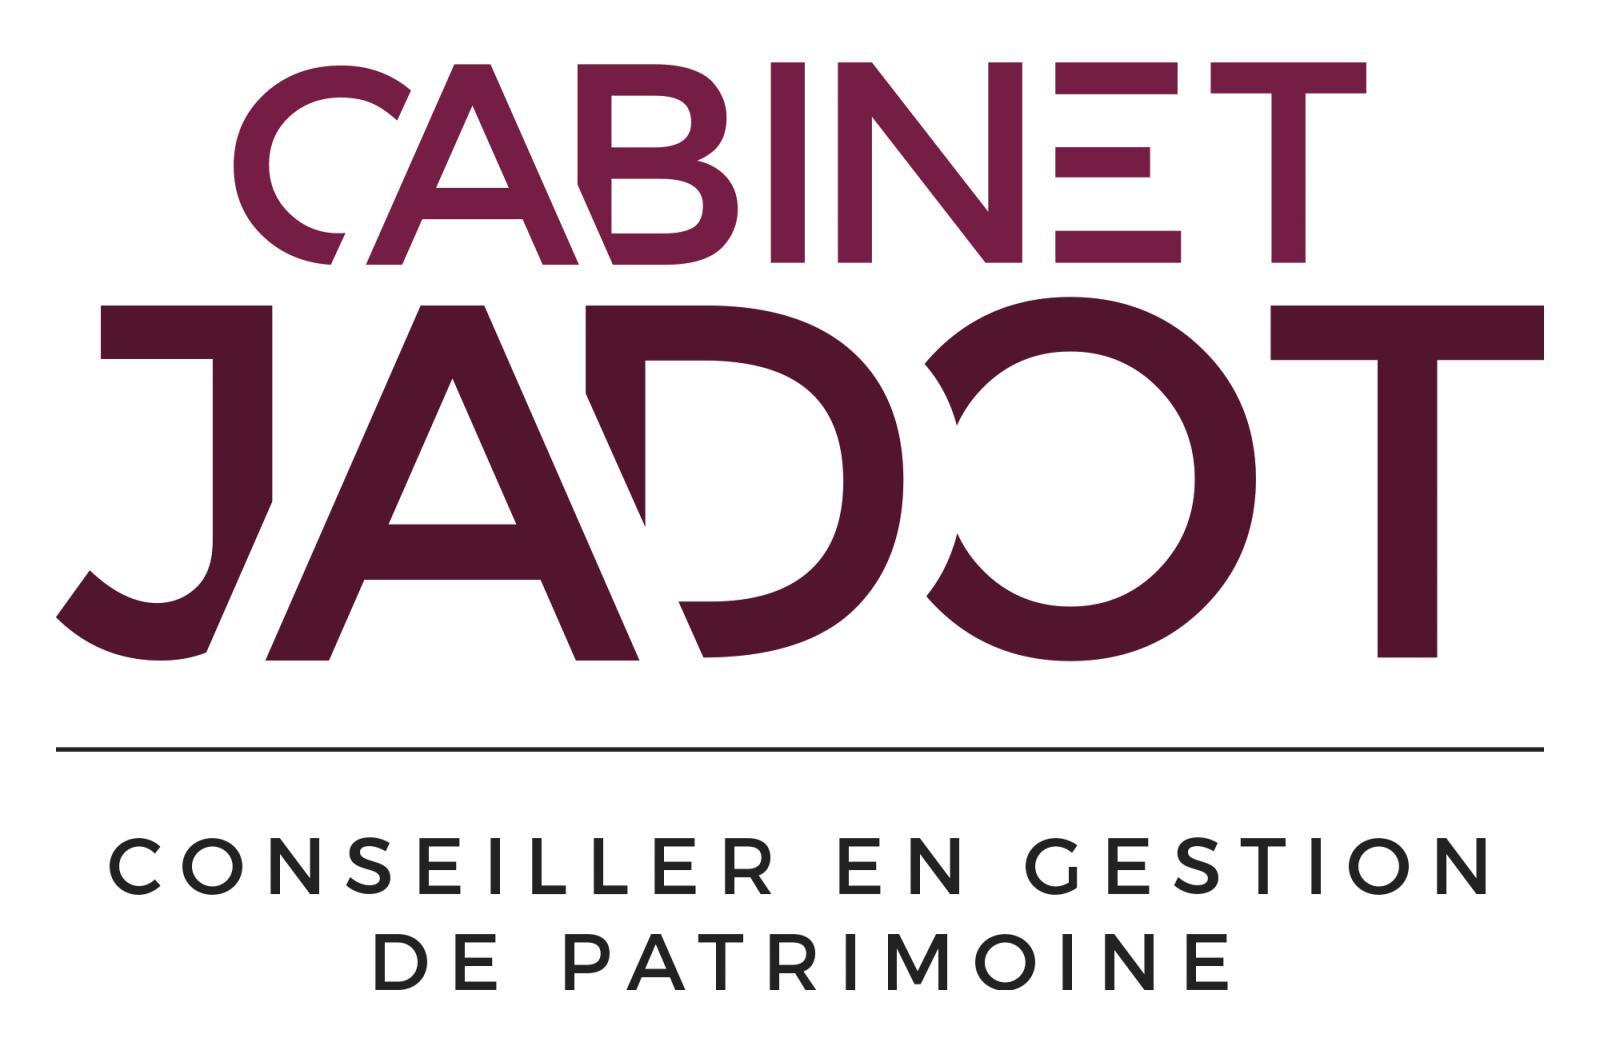 cabinet jadot gestion de patrimoine mulhouse 68 christian jadot